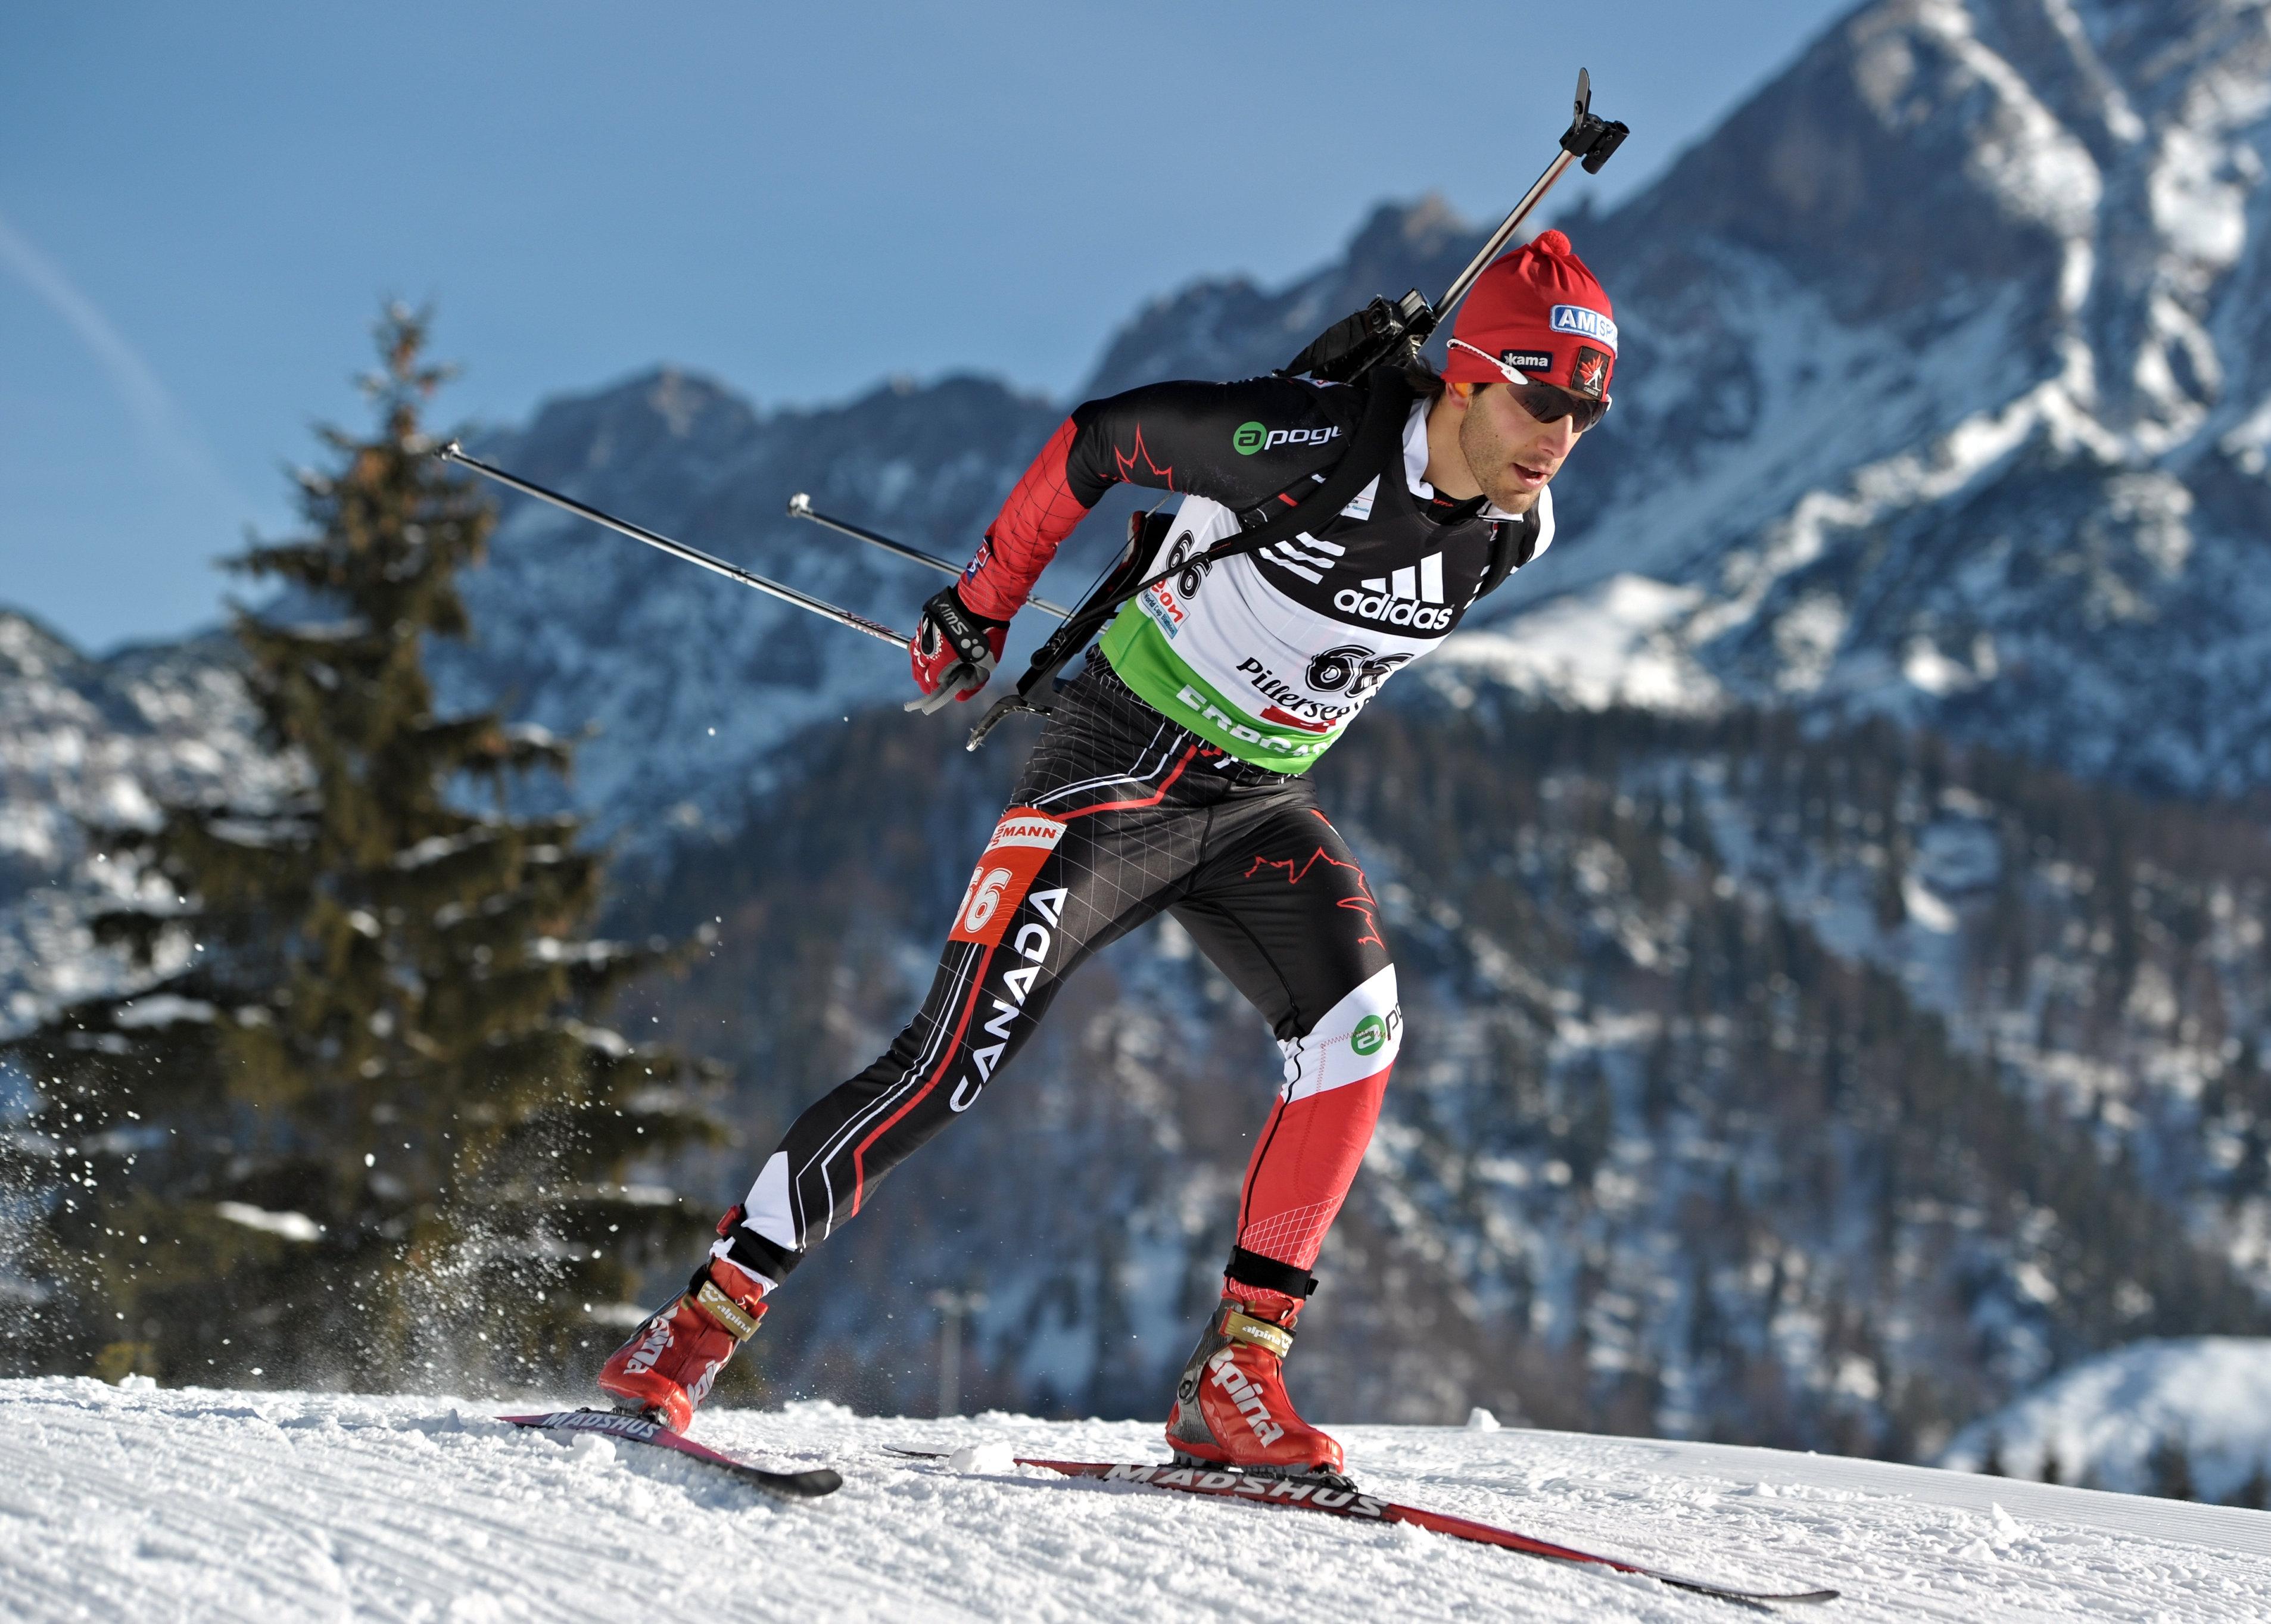 Biathlon Wallpaper Wallpapers High Quality